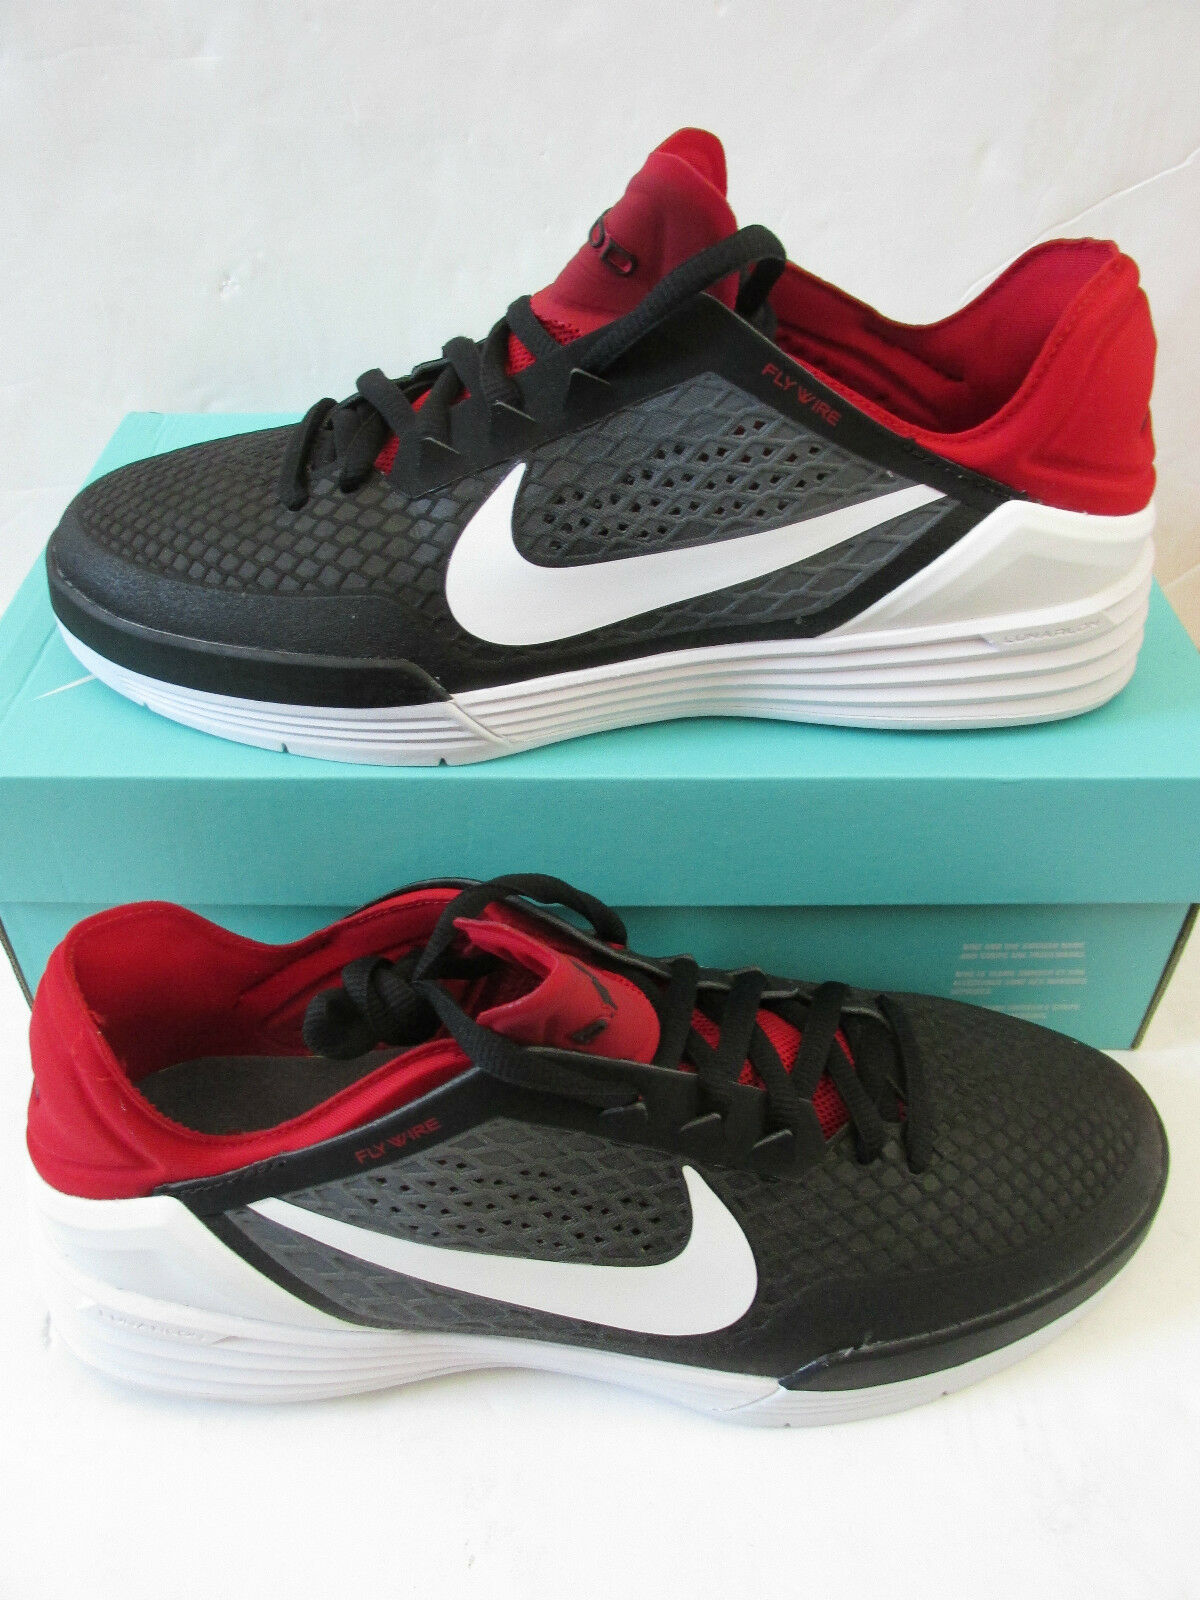 Nike paul rodriguez 8 Uomo formatori 654158 016 scarpe, scarpe